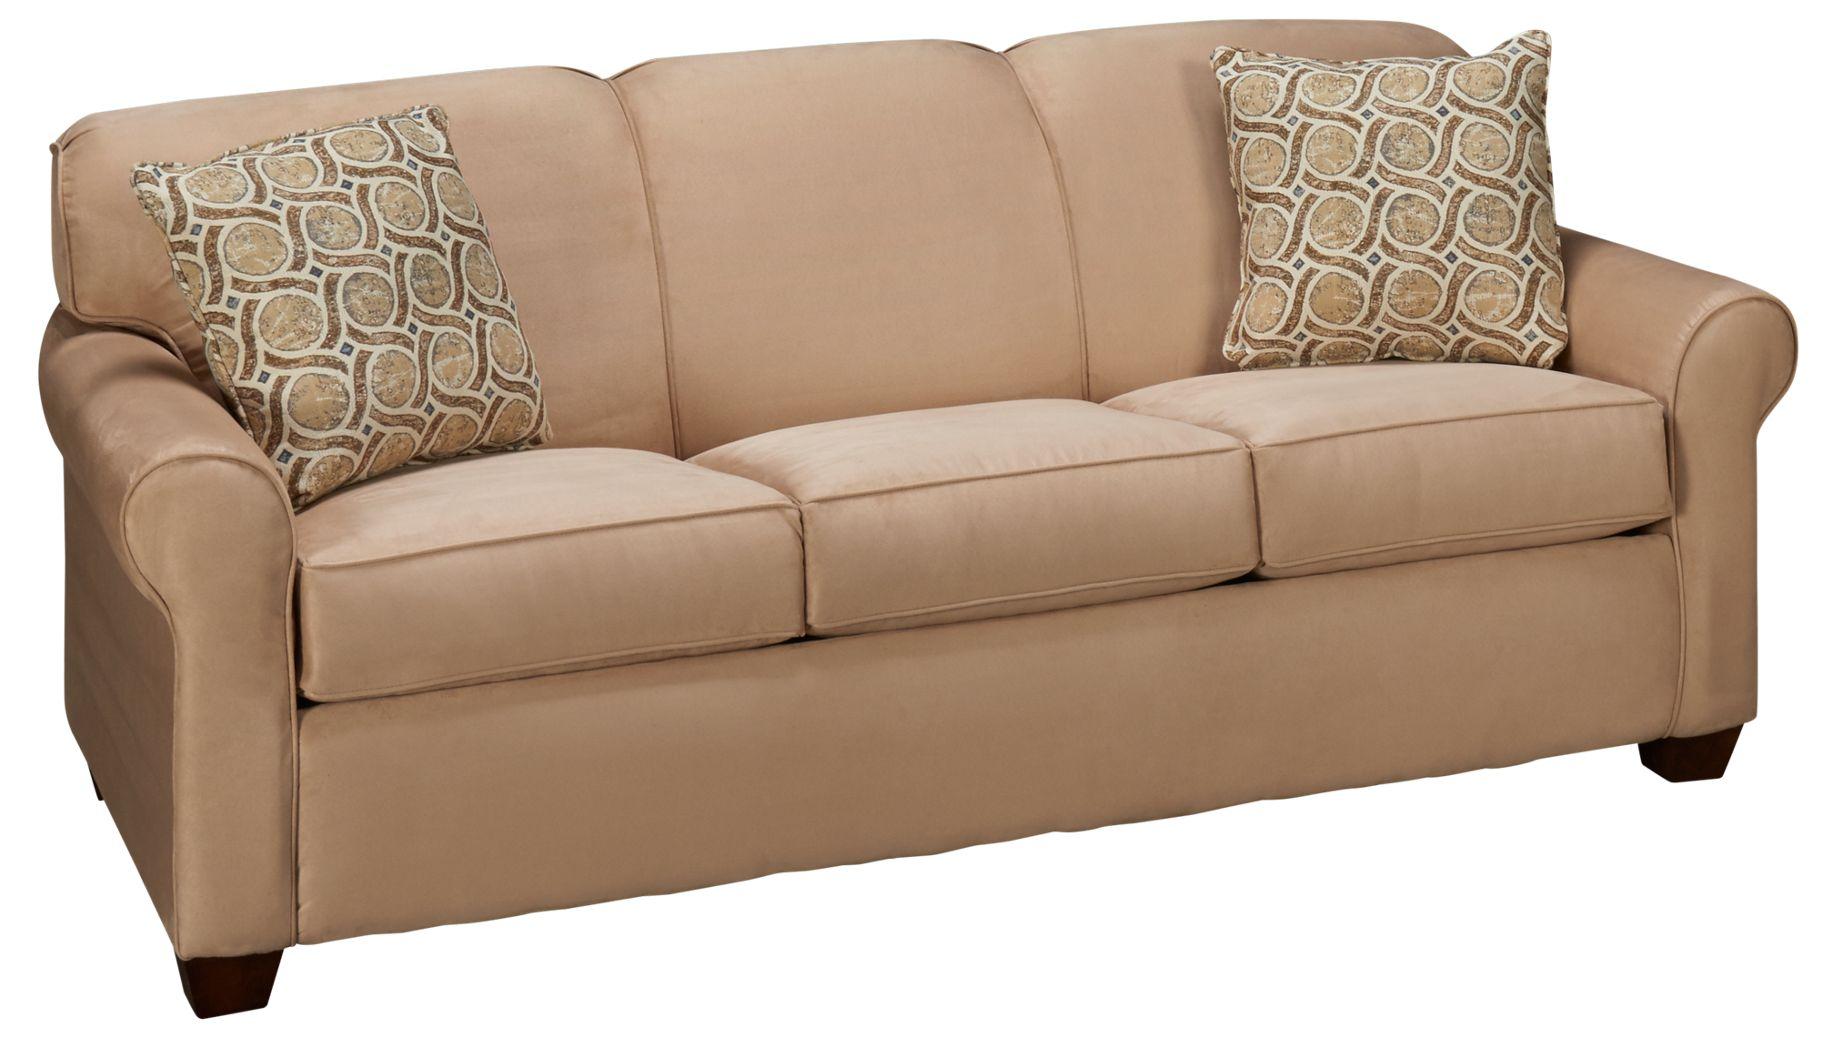 Klaussner Sleeper Sofa With Air Mattress Rs Gold Sofa